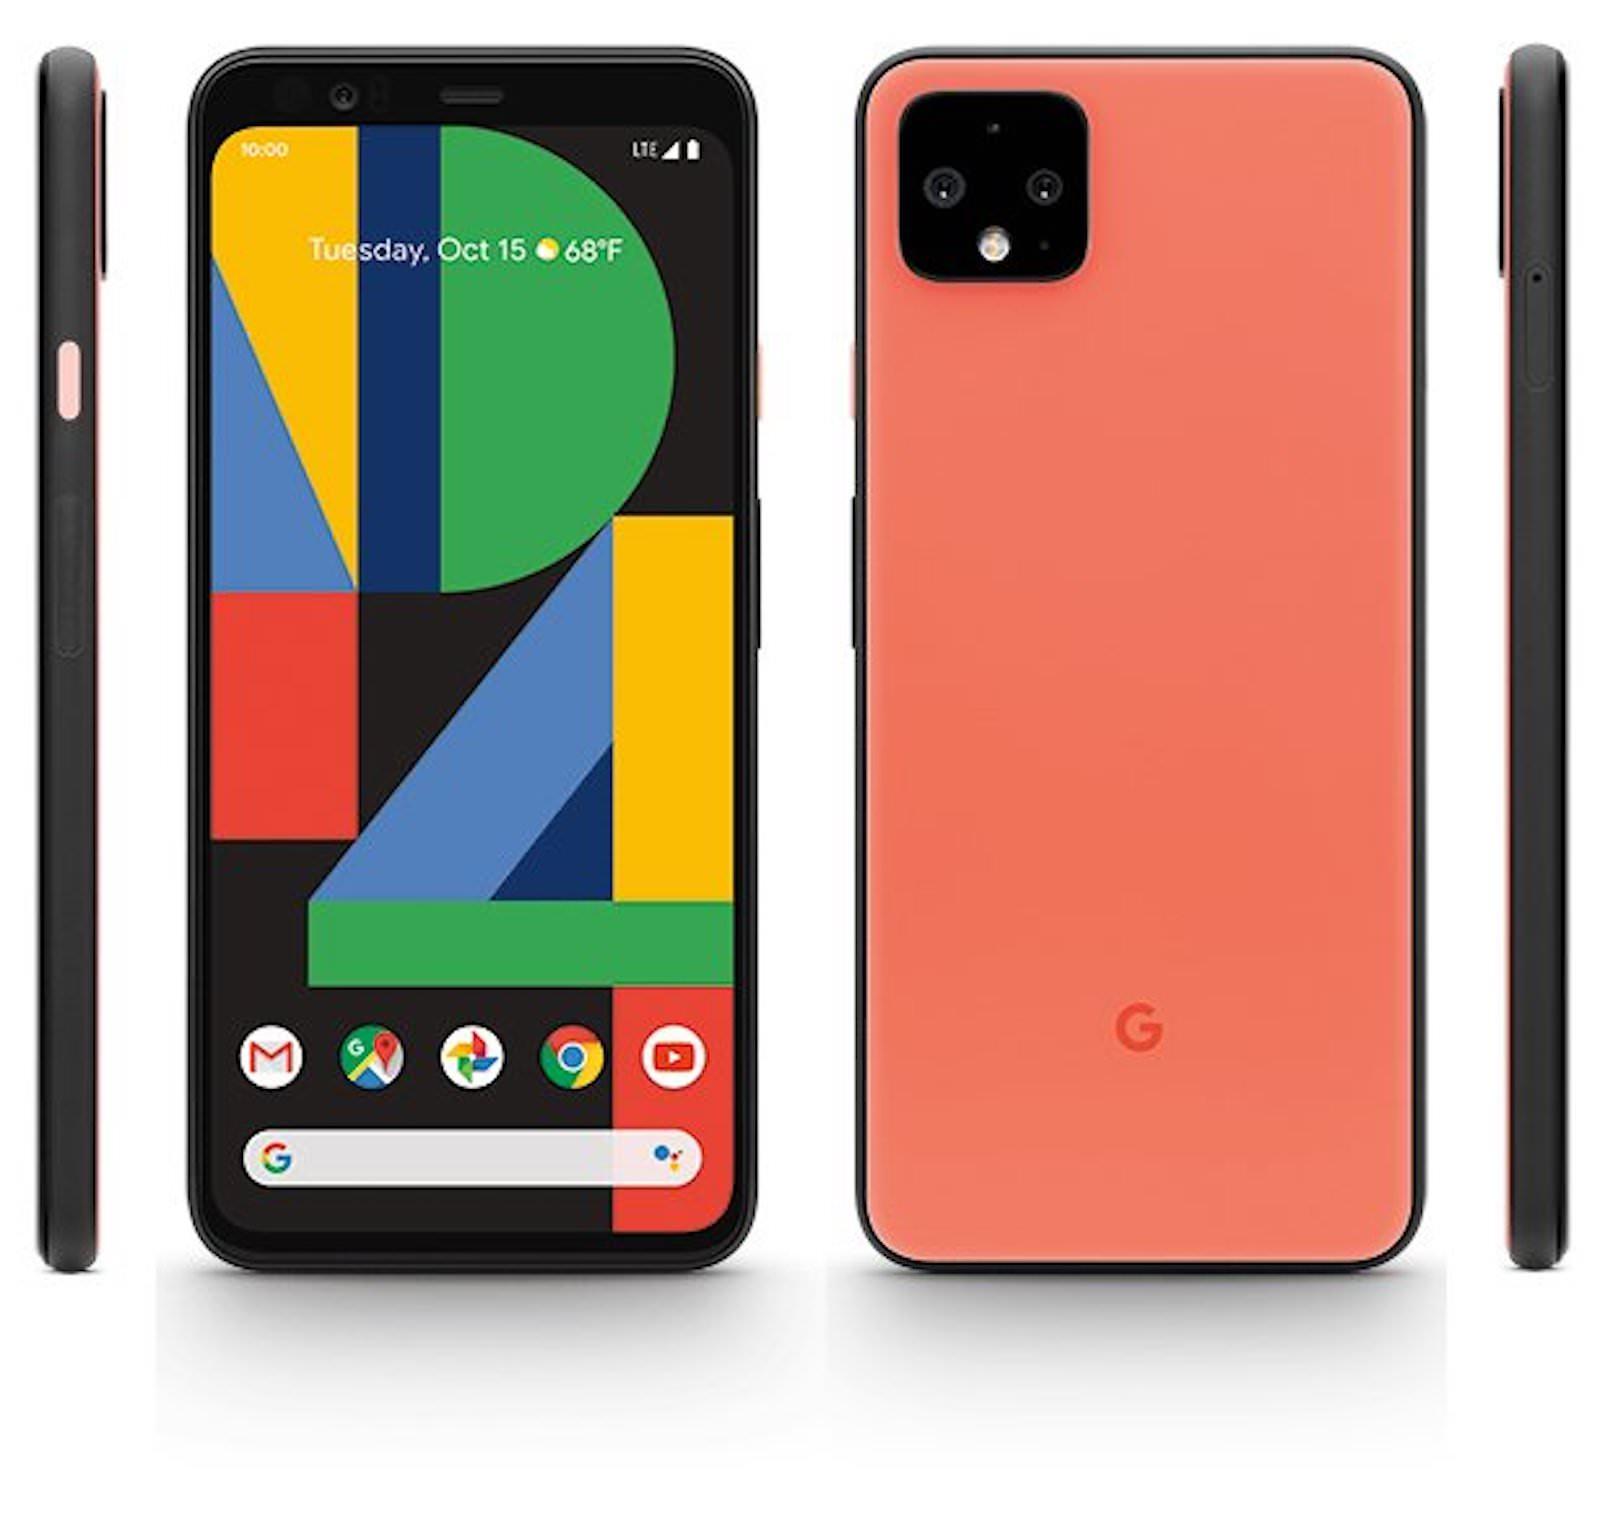 Google pixel 4 orange color